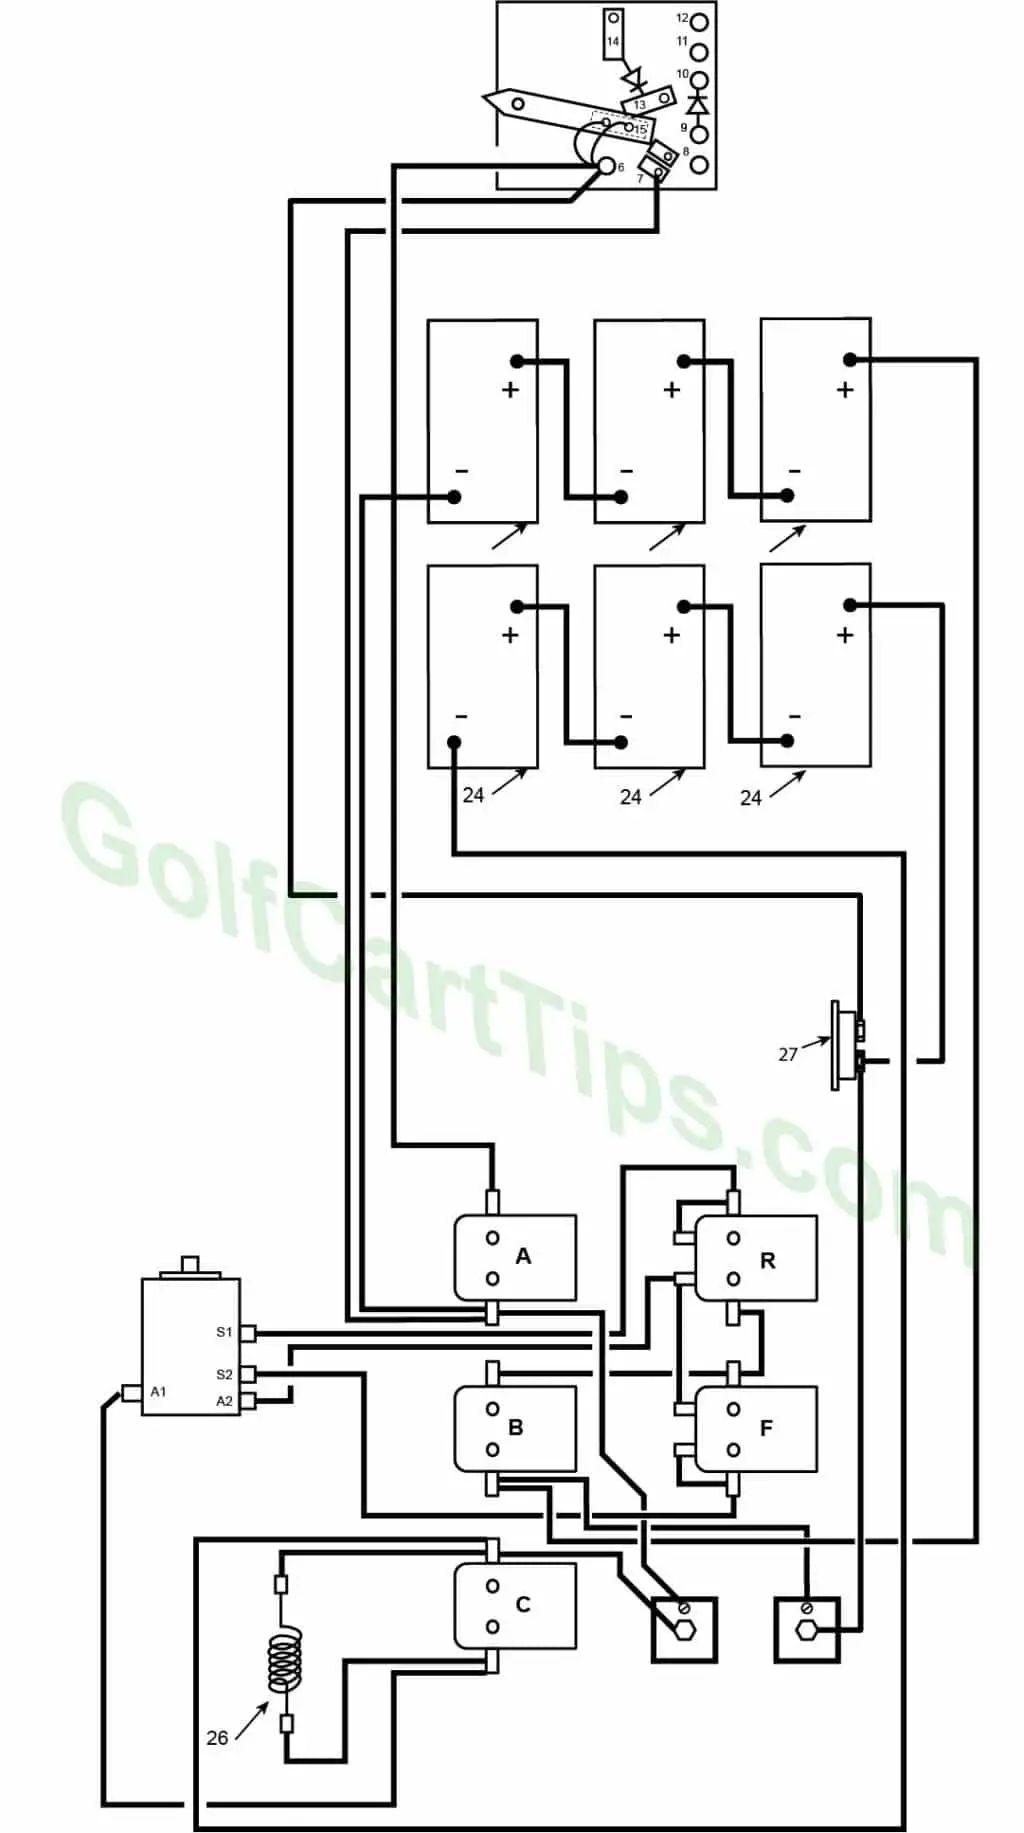 ezgo golf cart wiring diagram on golf cart ke light switch wiring